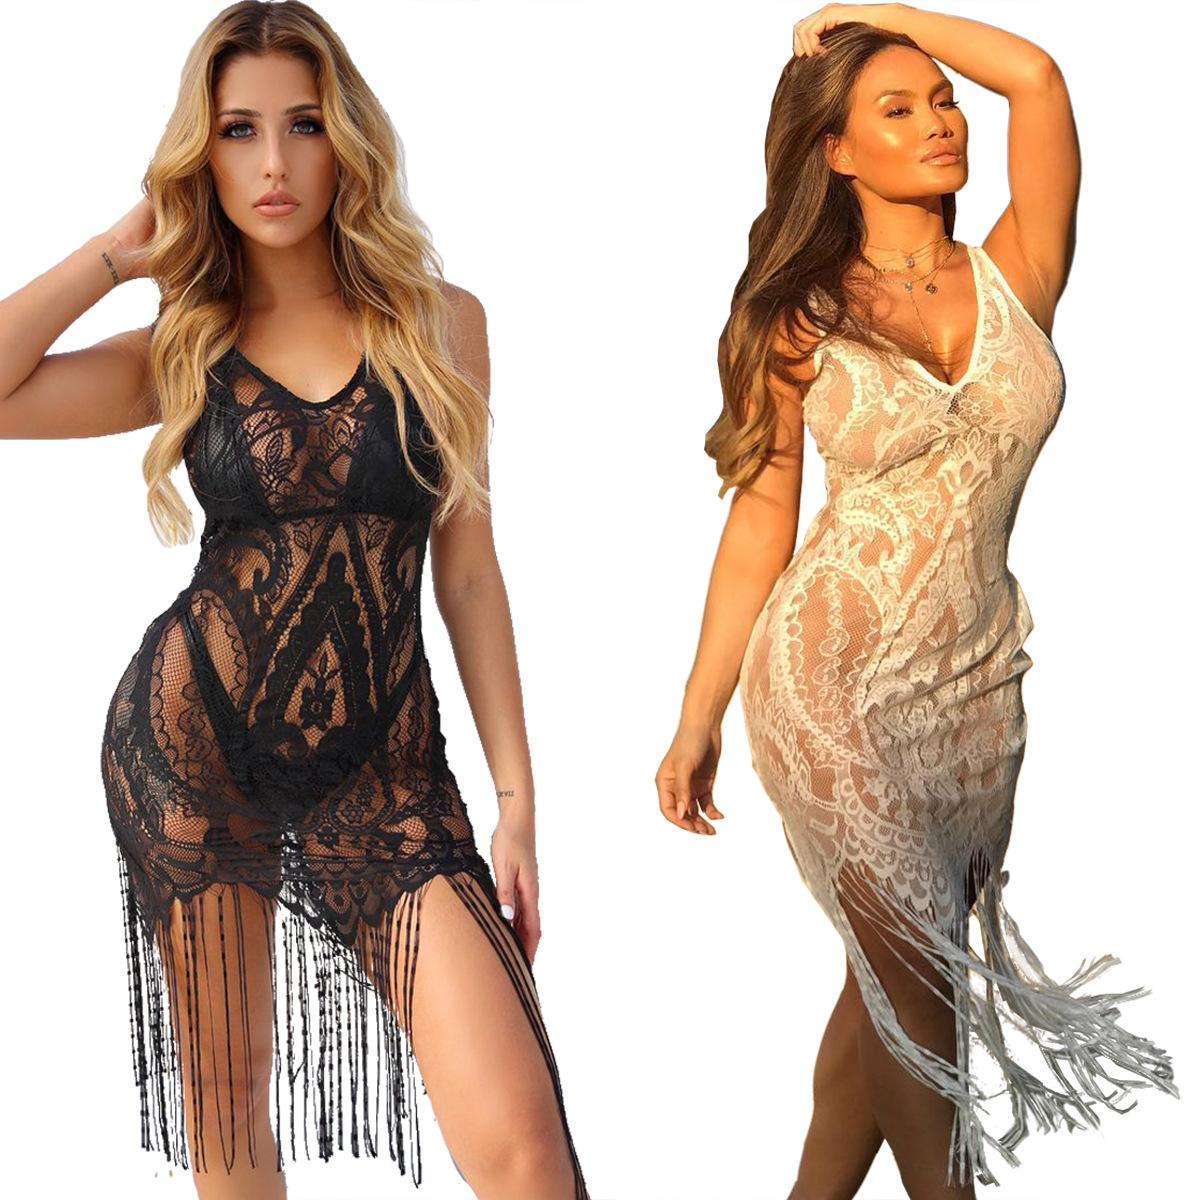 Black White Women Sexy See through Beach Pajamas Babydolls Lingerie Corsets Chemises Mini Cut Out Skirt Costumes Dress Wear Skirt pt12